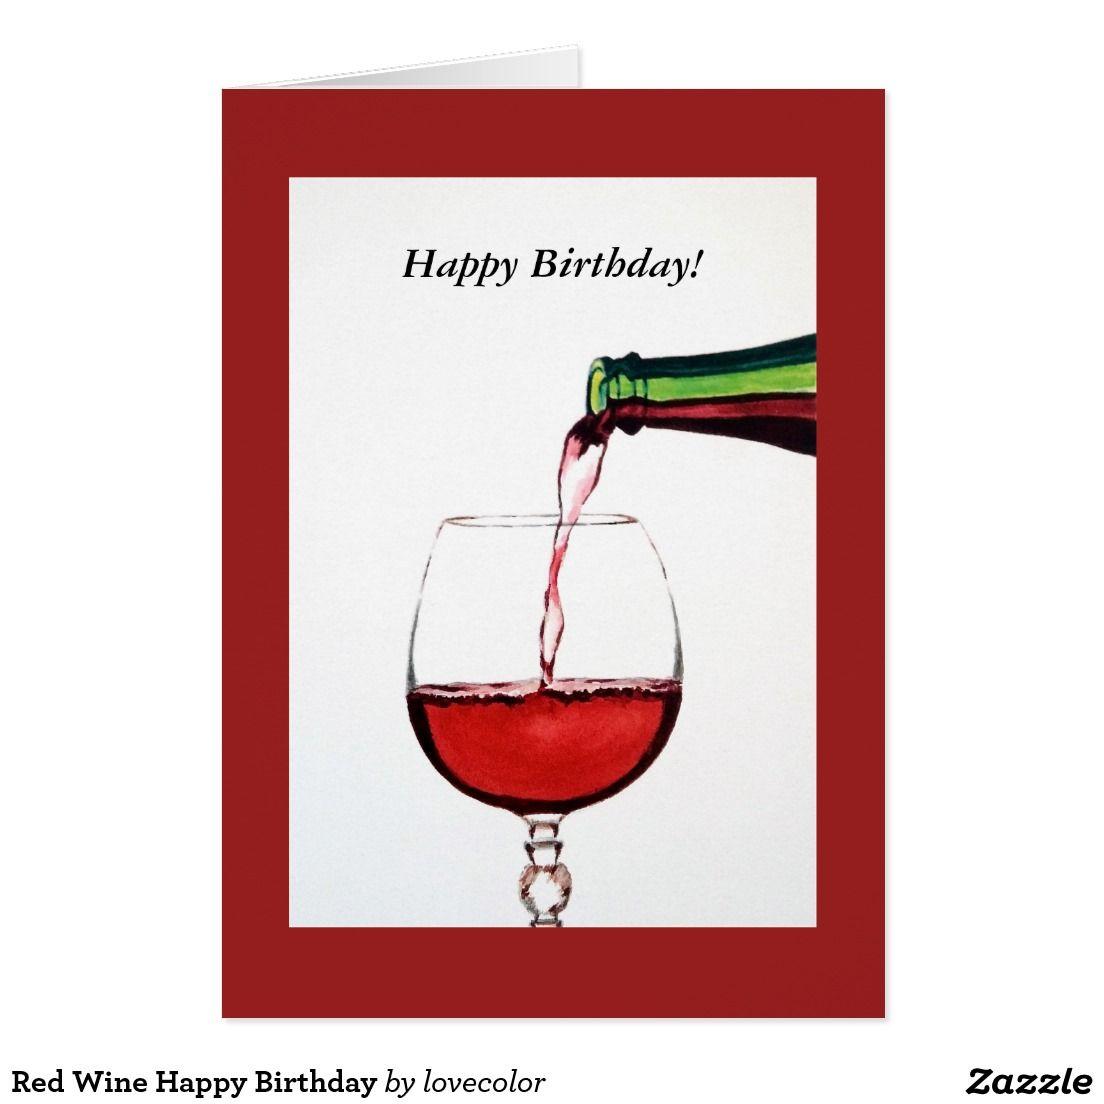 Red Wine Happy Birthday Card Zazzle Com Happy Birthday Wine Wine Birthday Cards Happy Birthday Wine Card